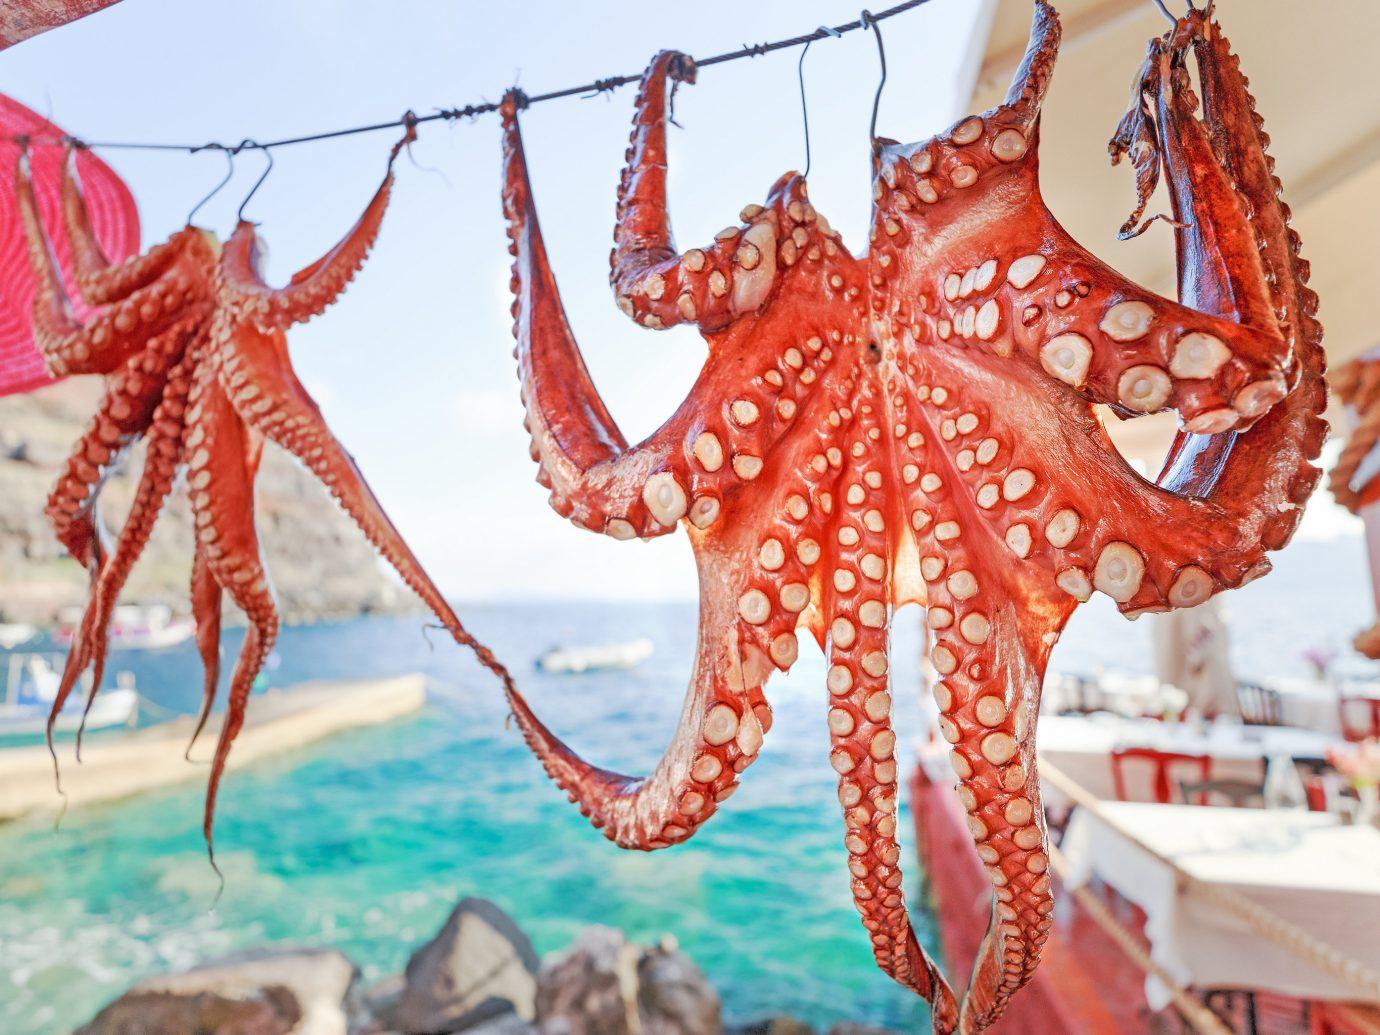 Trip Ideas octopus invertebrate cephalopod marine invertebrates